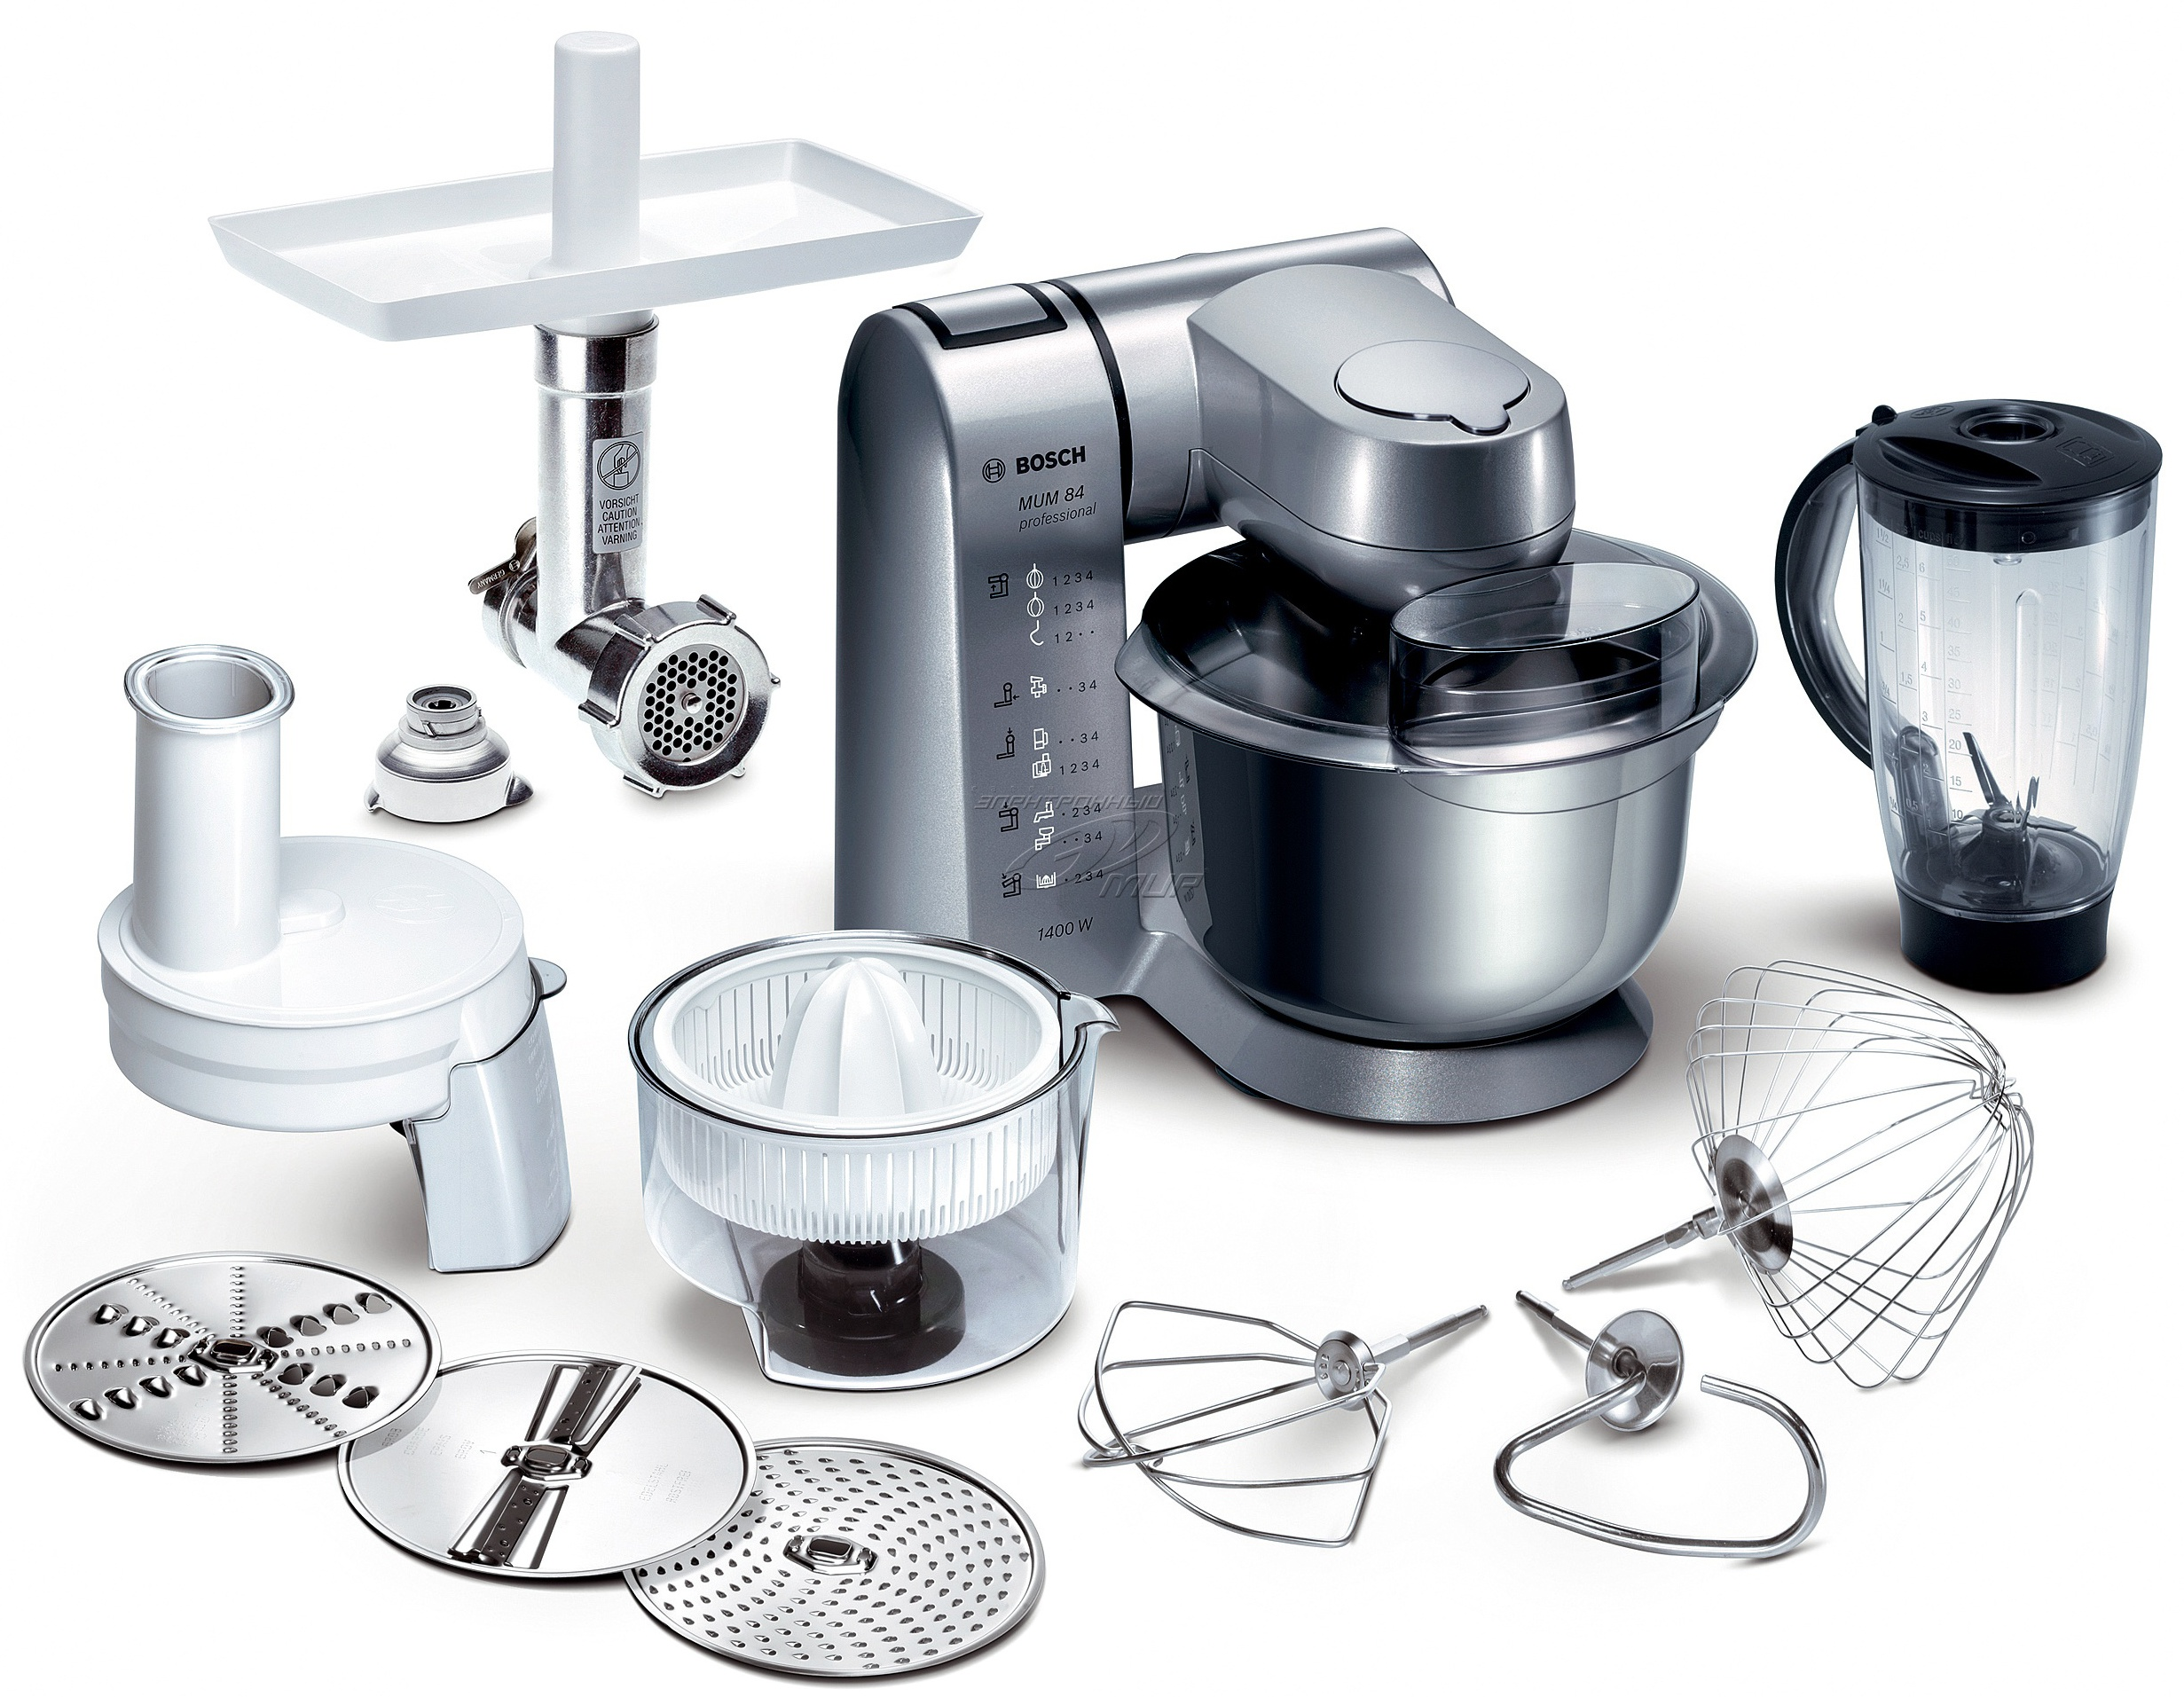 Преимущества кухонного комбайна